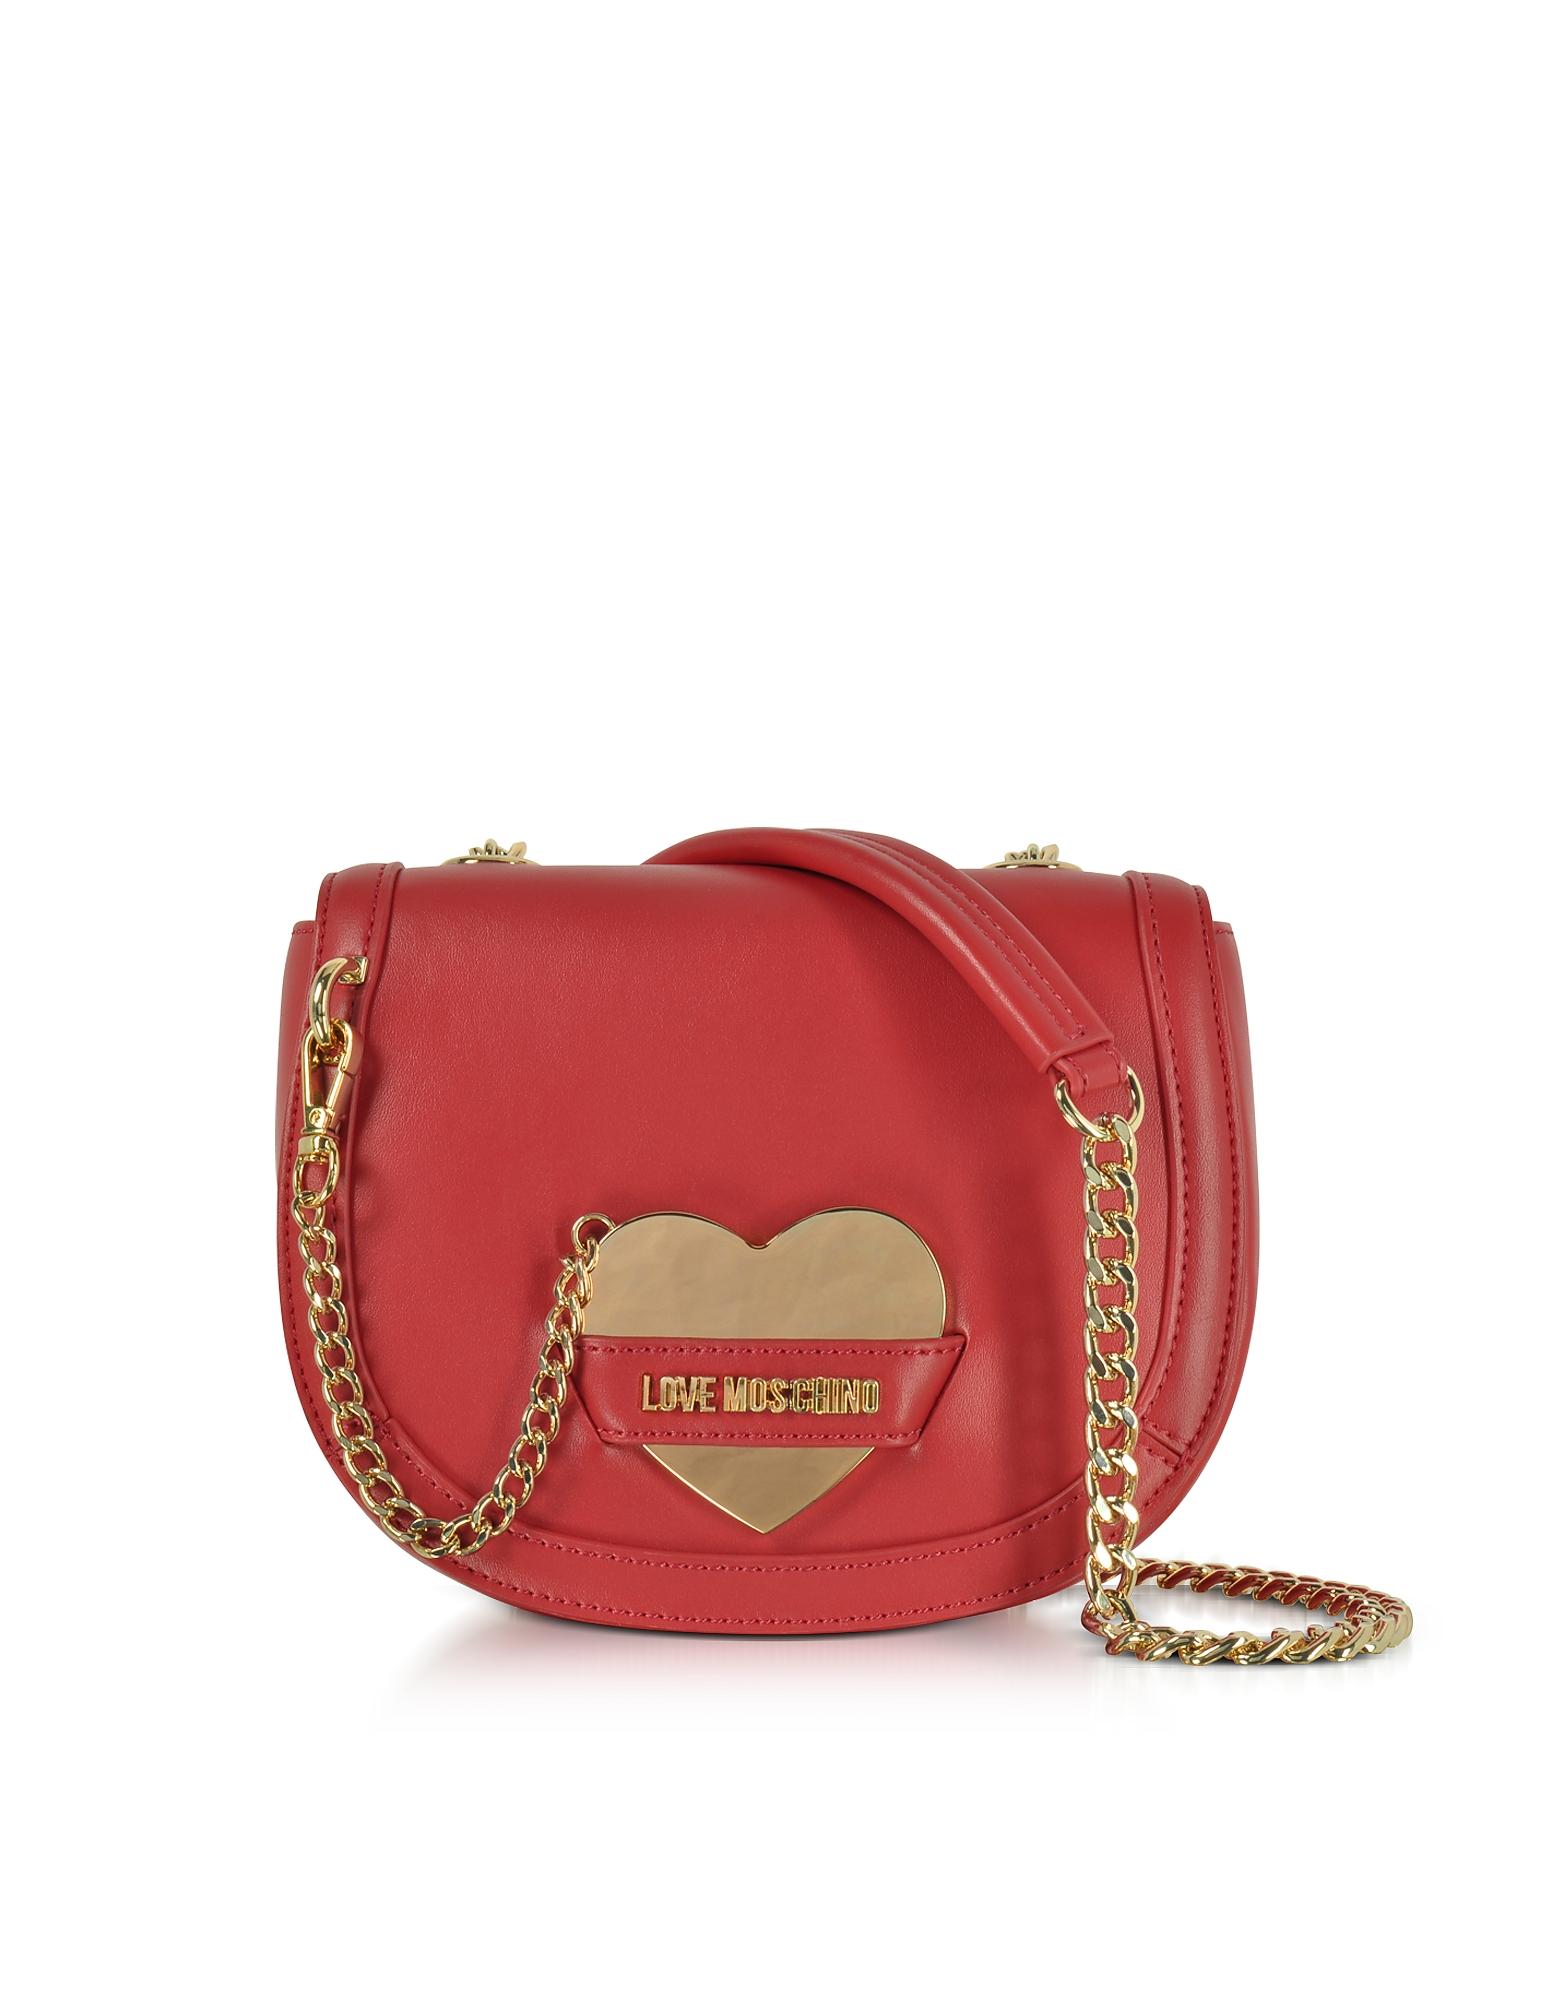 Love Moschino Handbags, Detachable Heart Red Eco-Leather Crossbody Bag